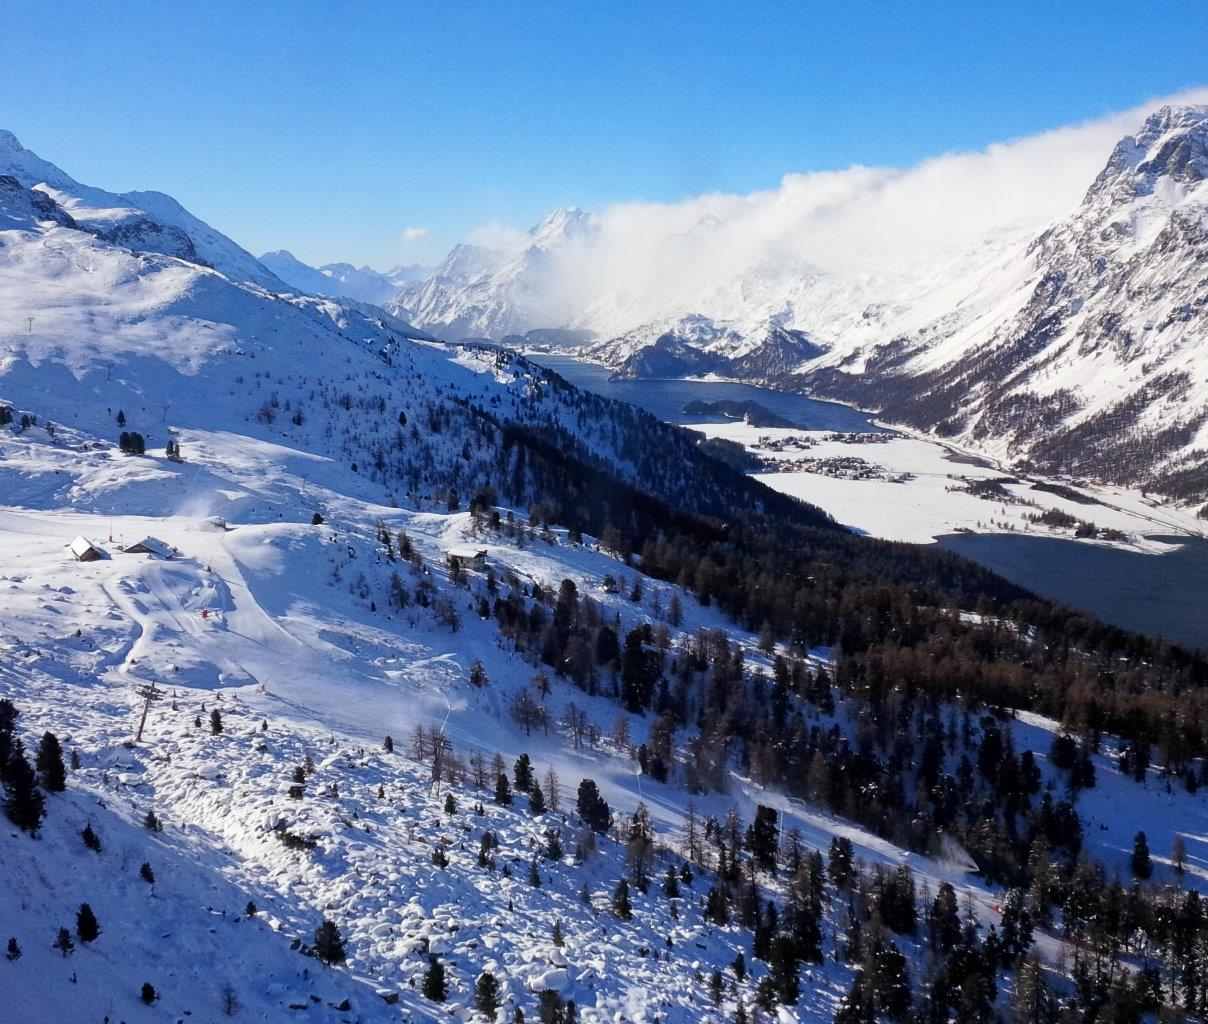 St. Mortiz is open for ski season